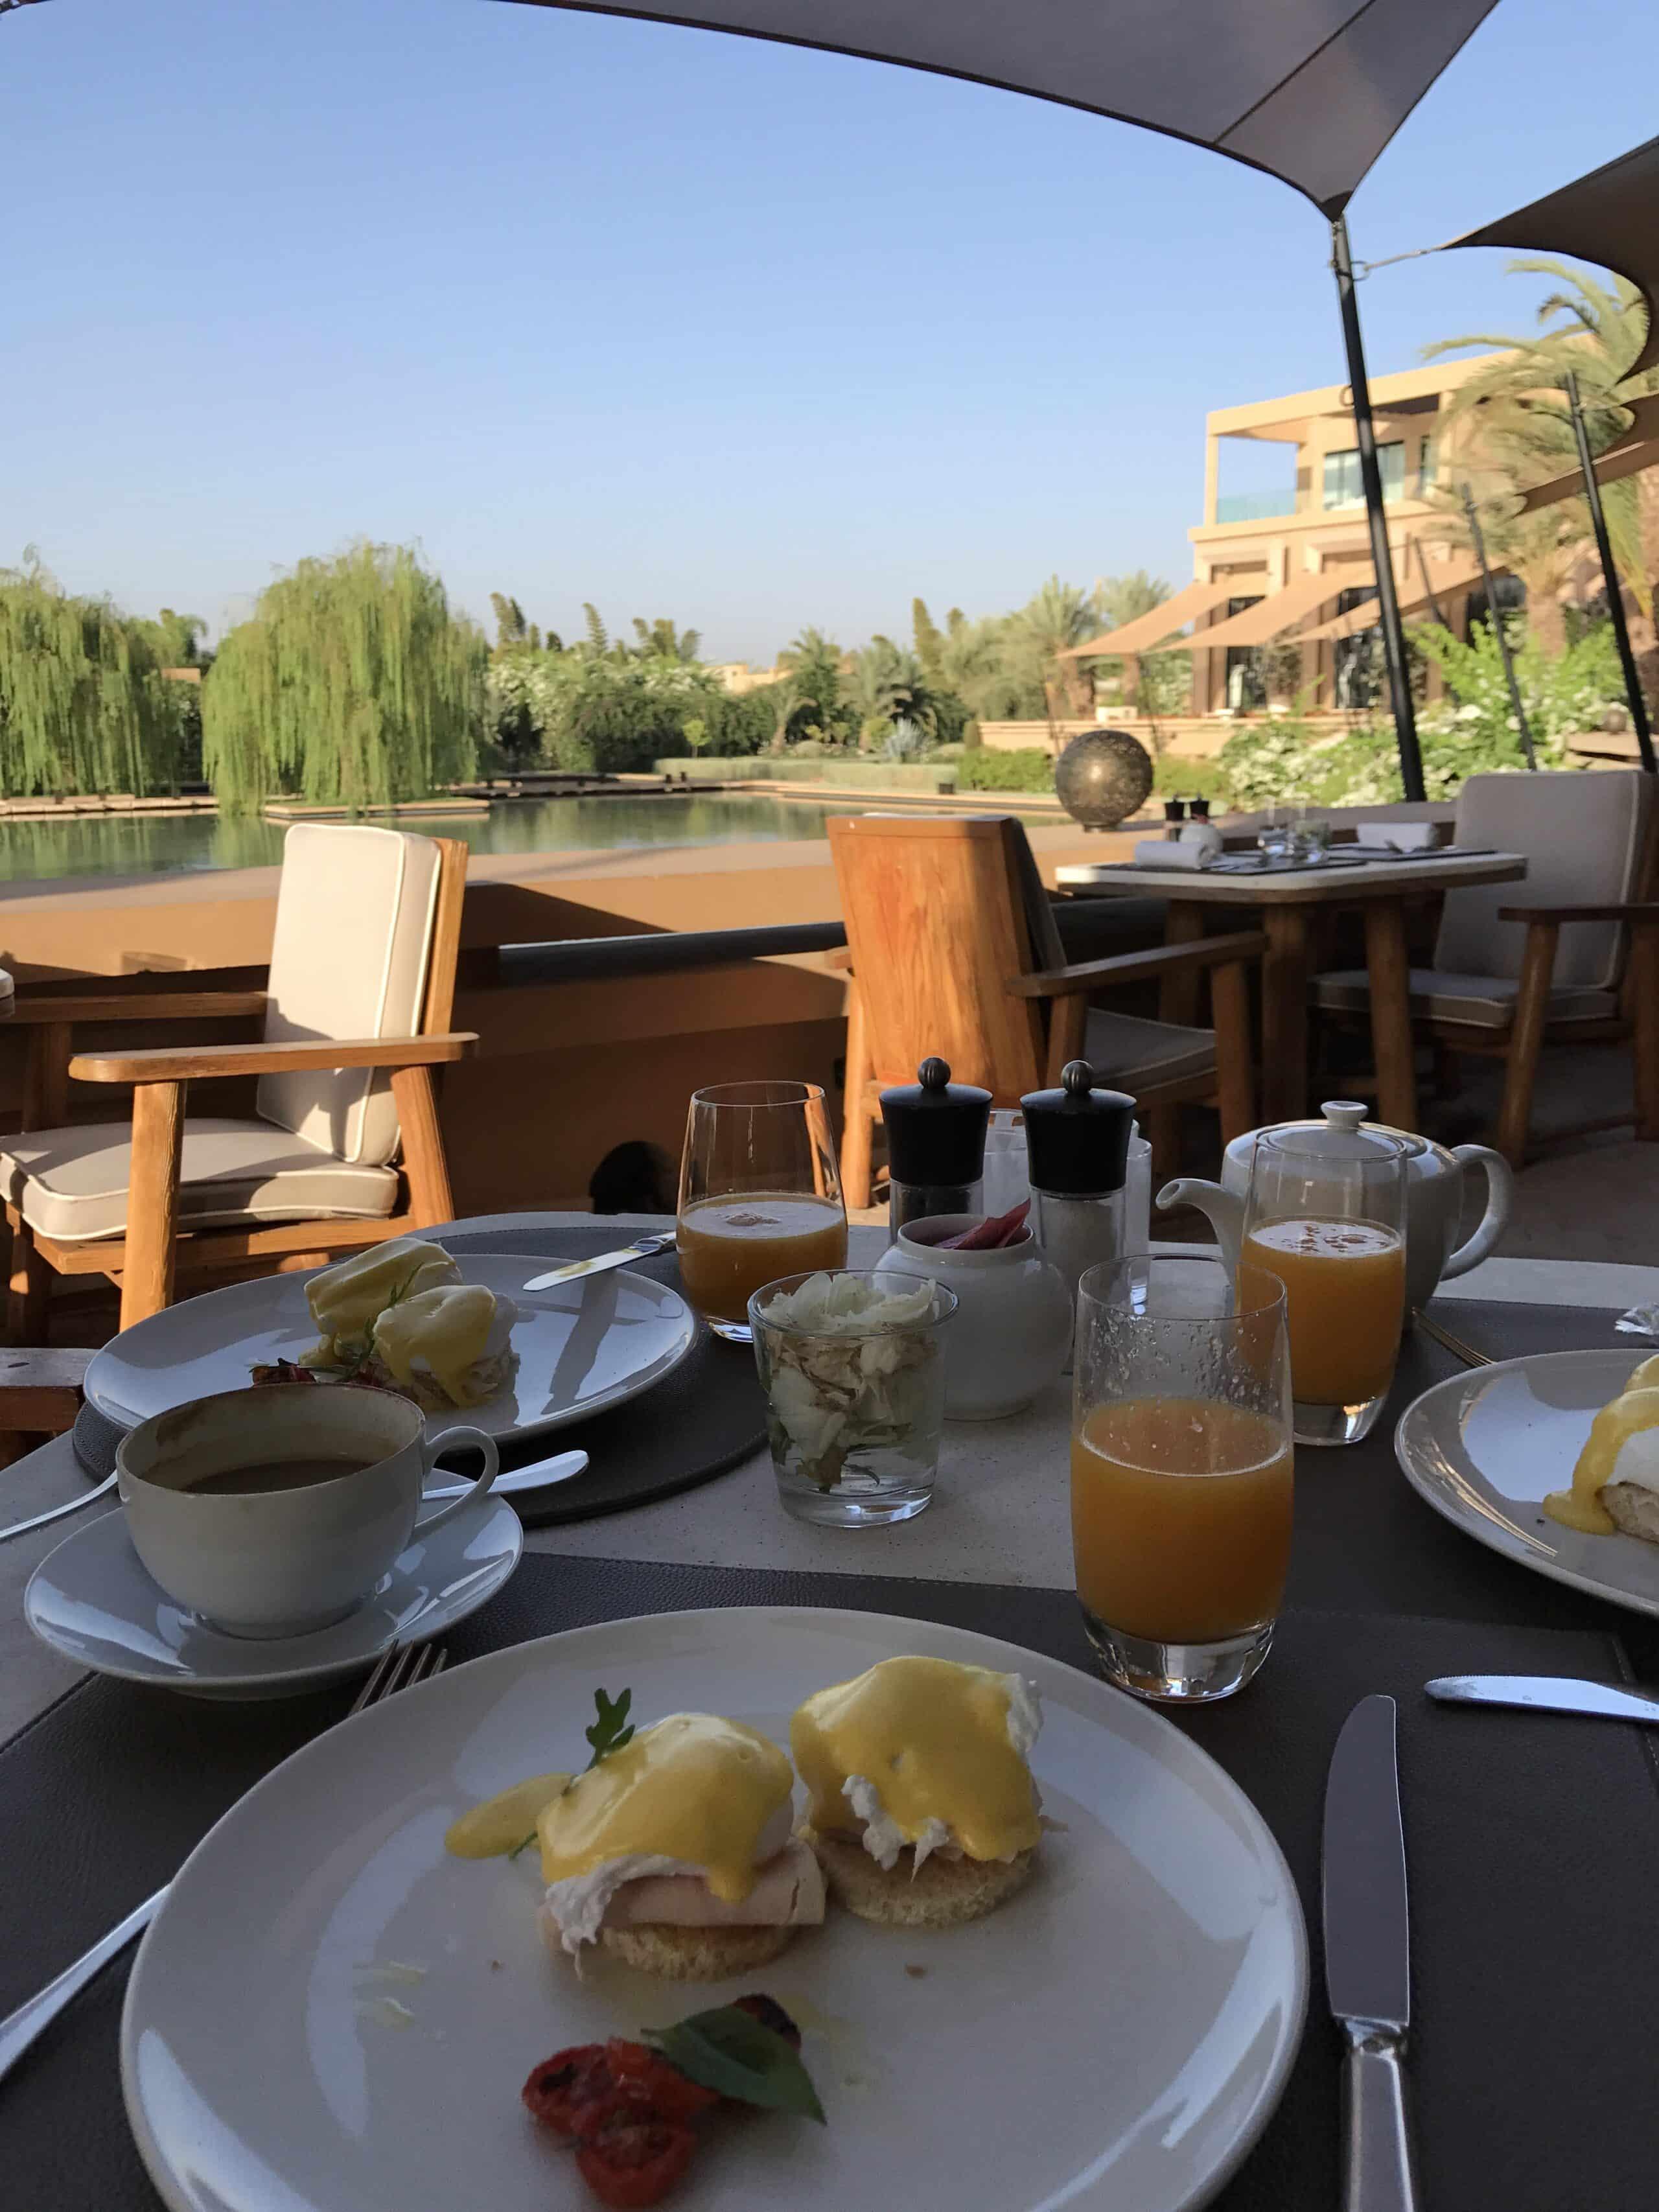 onde ficar em marrakech mandarin oriental Foto: Luis Felipe Di Mare